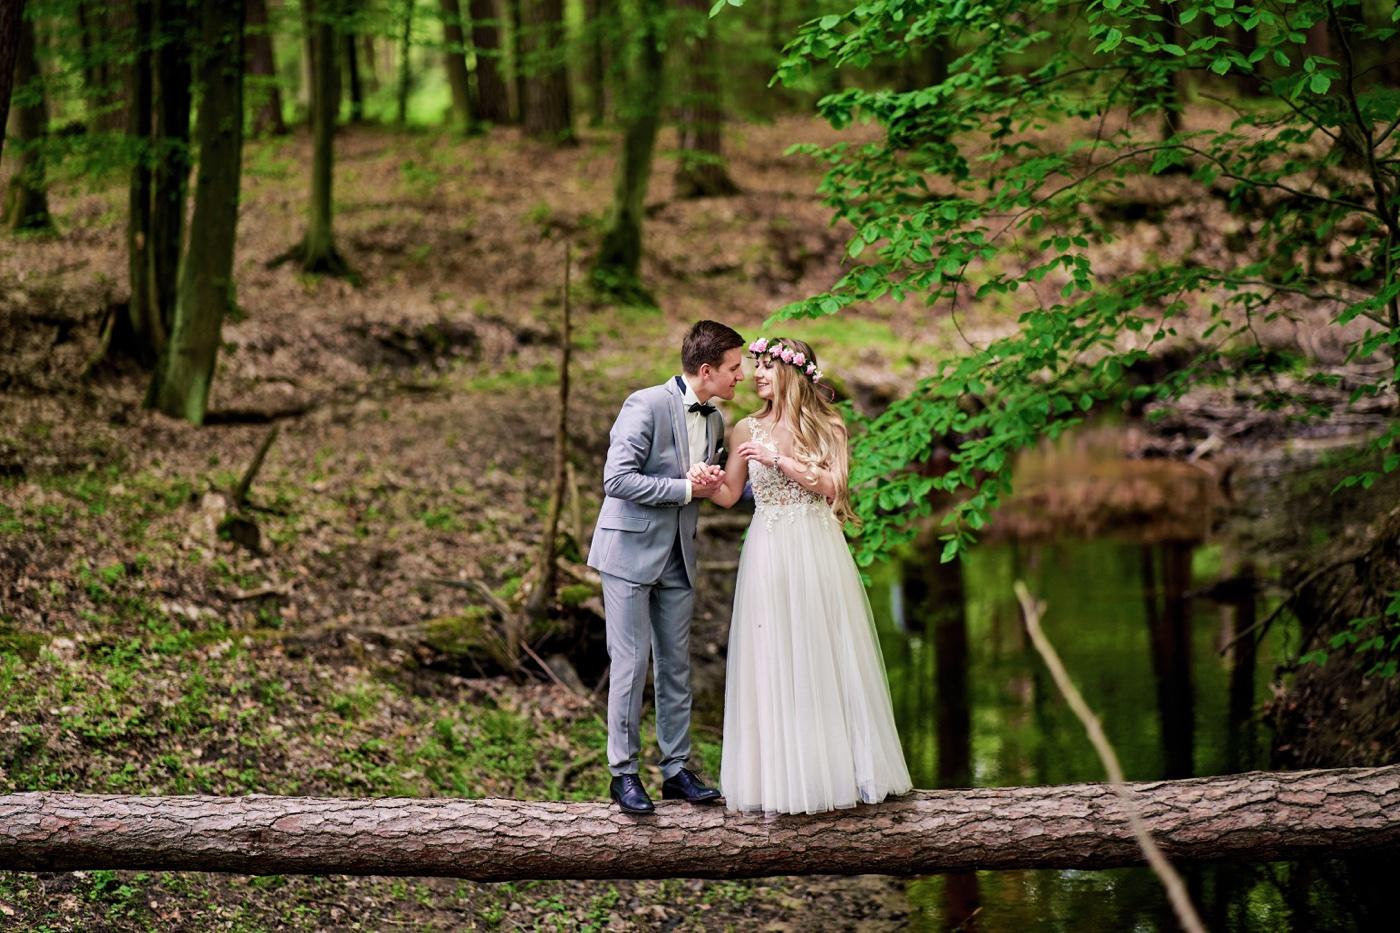 fotograf ślubny skopanie